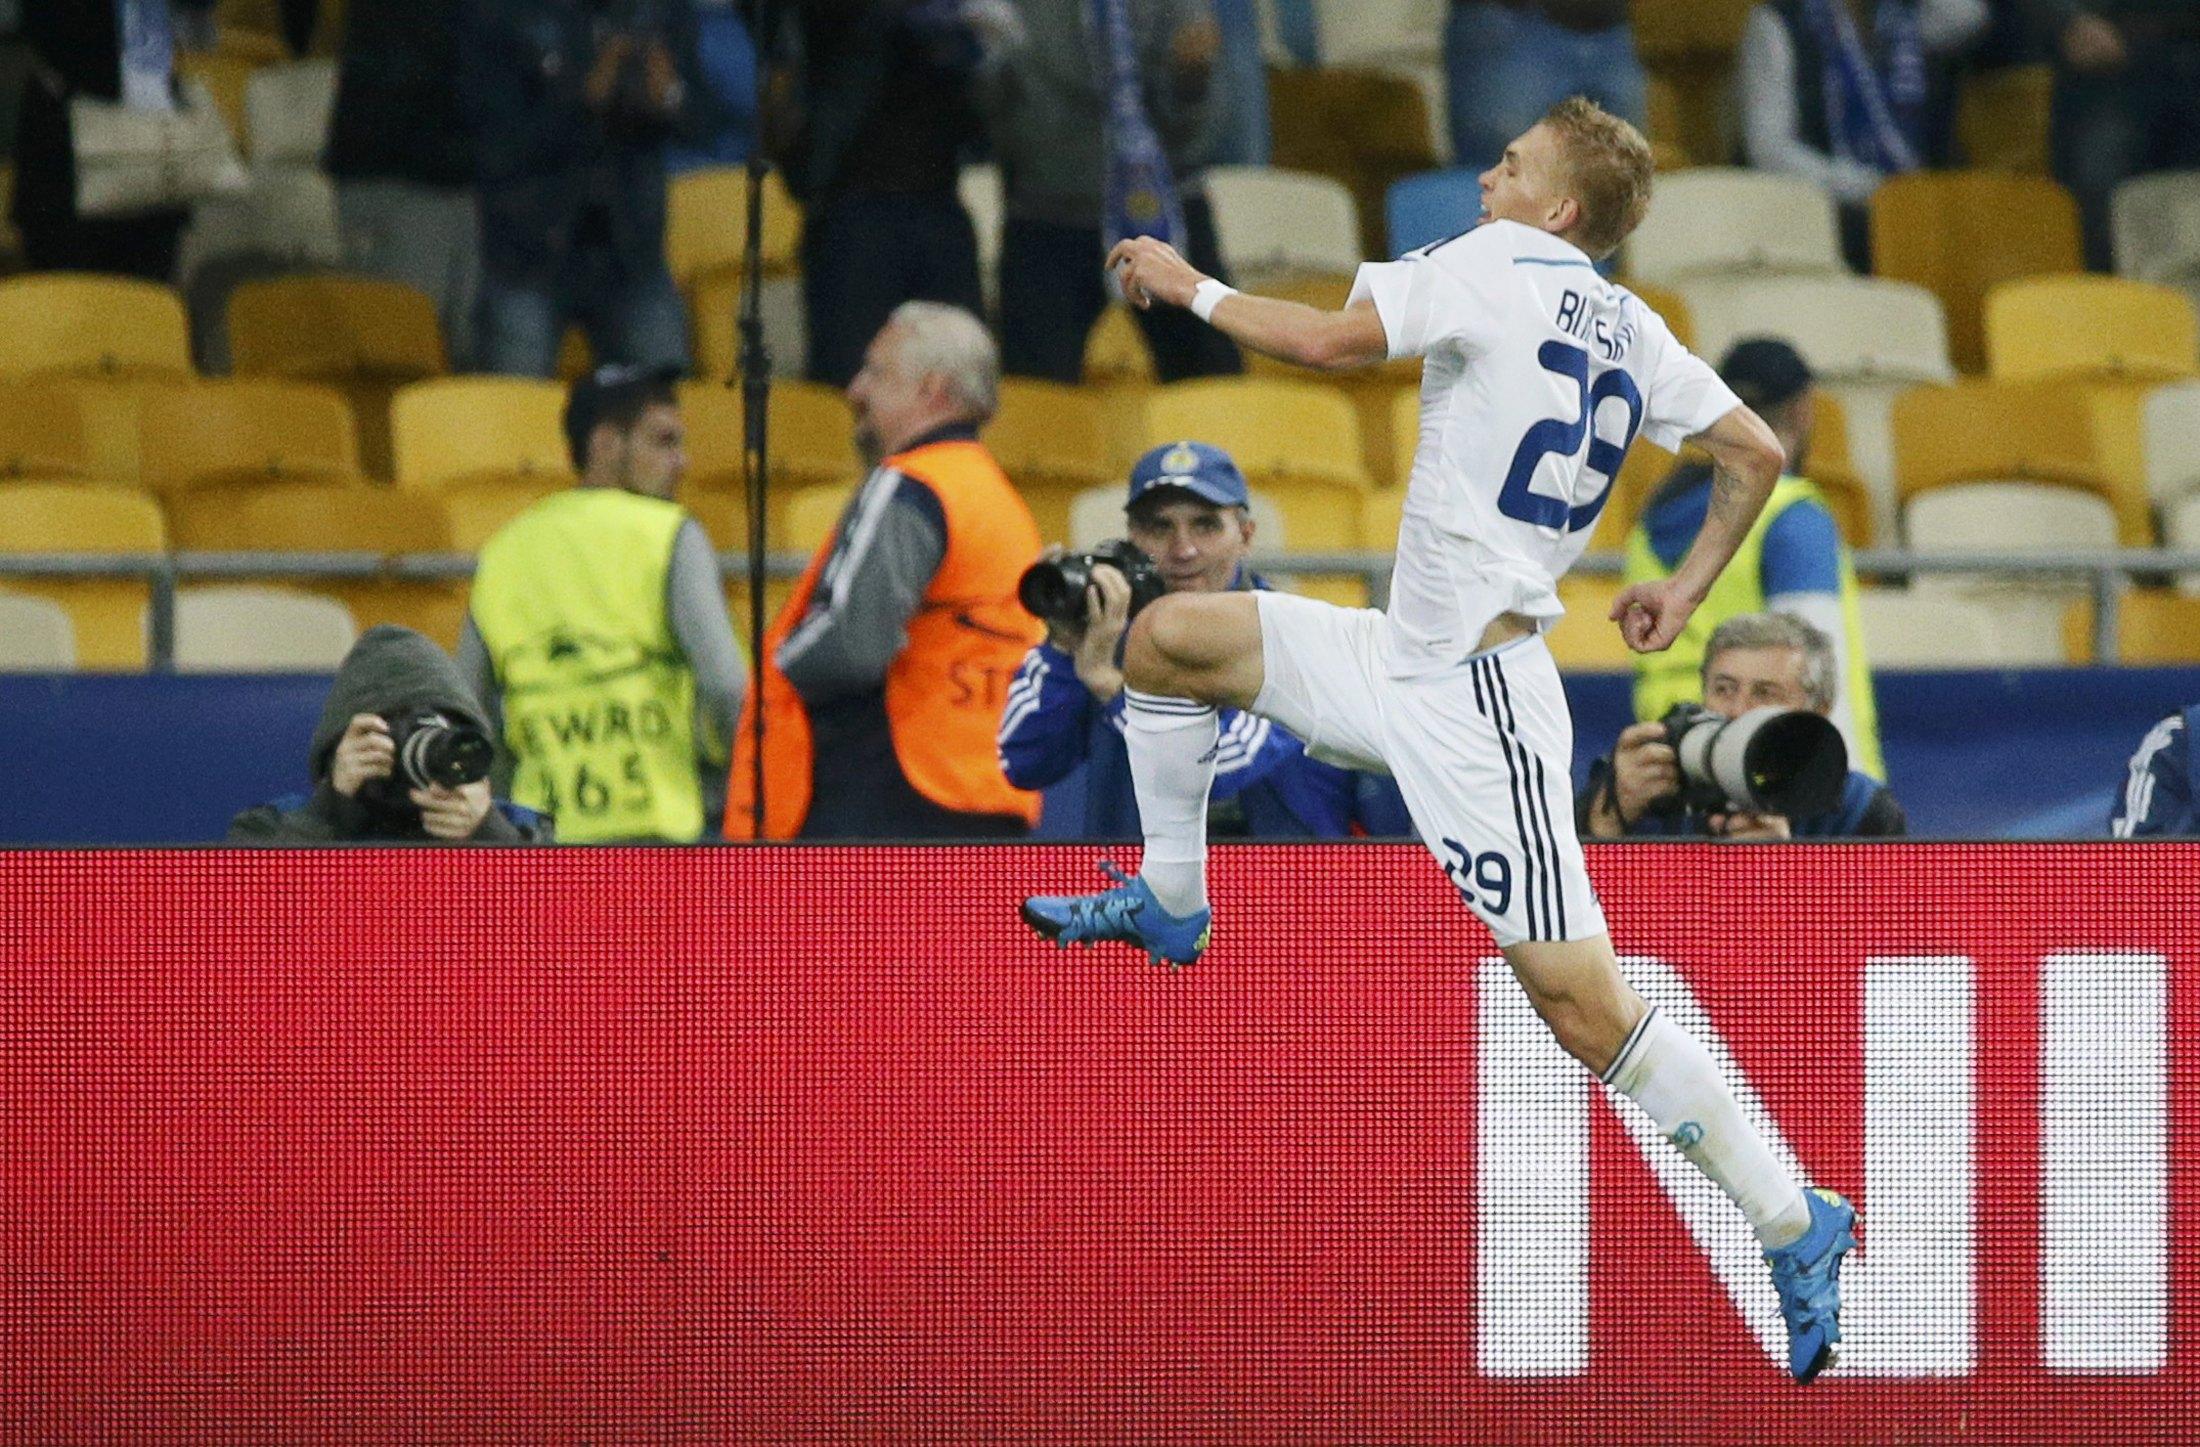 Dynamo Kiev's Vitaliy Buyalskiy celebrates his goal during the Champions League group G soccer match against Porto at the Olympic stadium in Kiev, Ukraine, September 16, 2015. REUTERS/Gleb Garanich